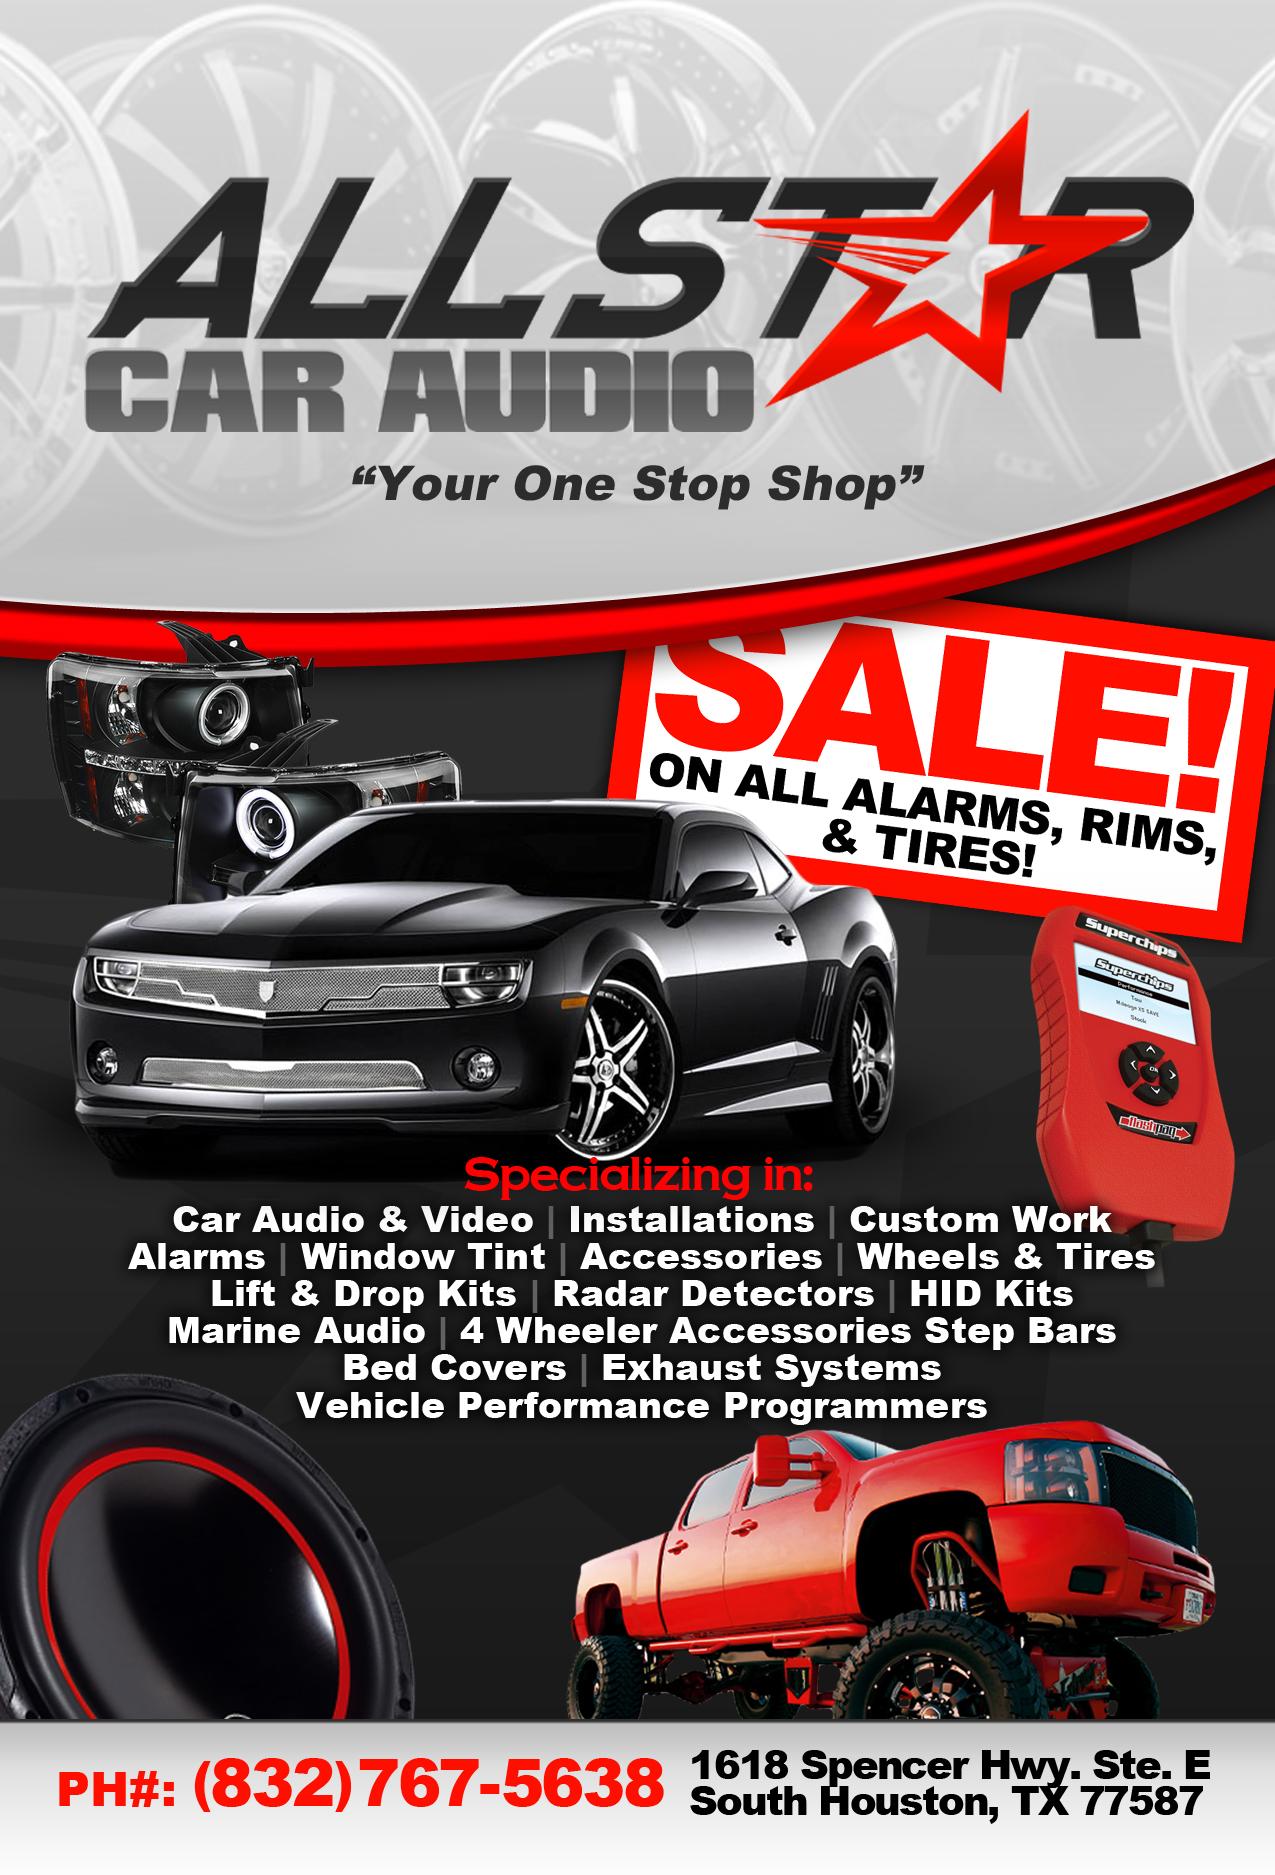 Luxury Car Rental Houston >> All Star Car Audio 1618 Spencer Hwy, South Houston, TX 77587 - YP.com